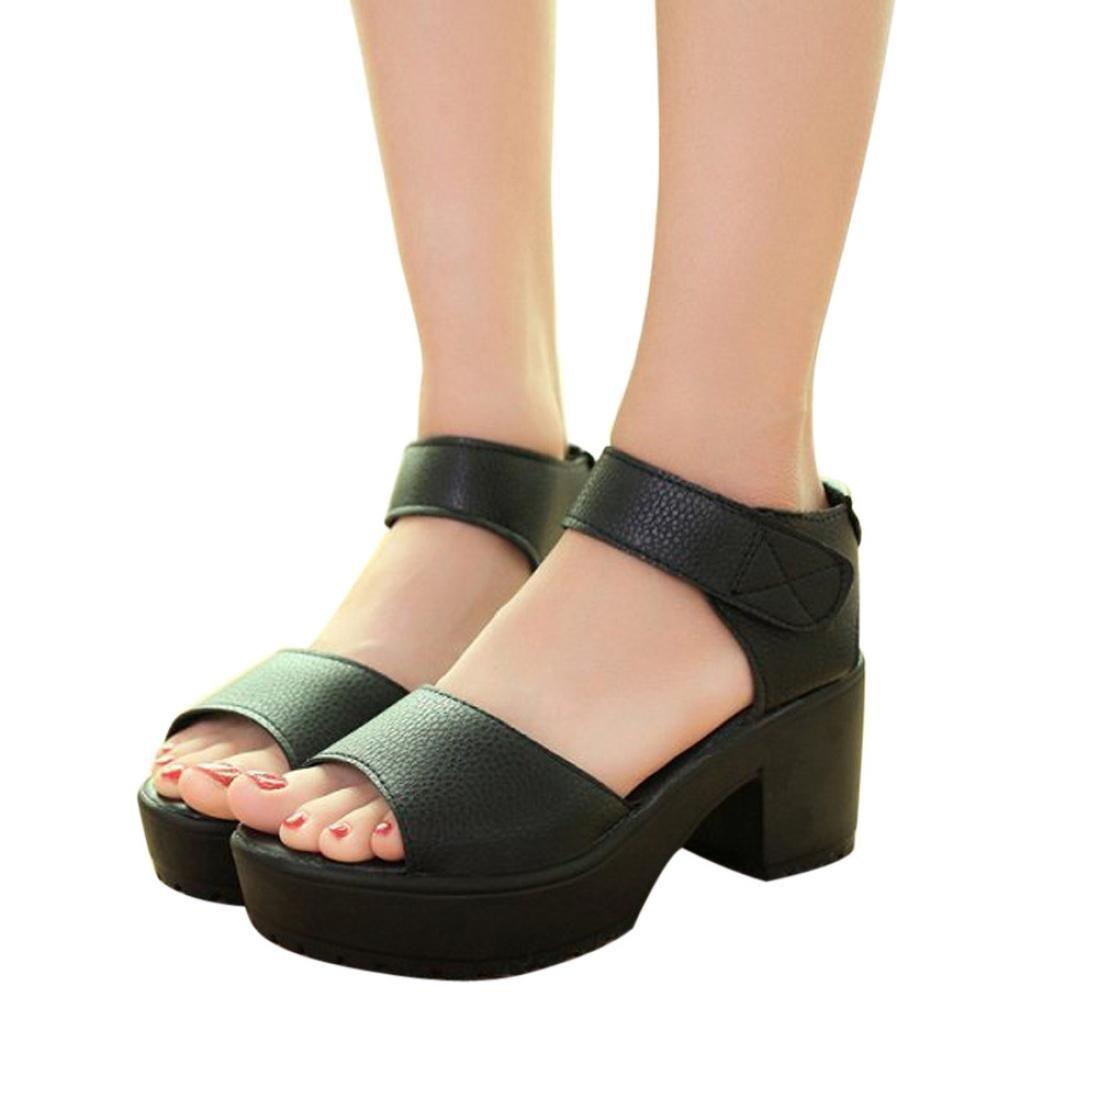 46ce6e84a5d Amazon.com   Hunputa Women Open Toe Peep Toe Platform High Heel Gladiator  Sandals Chunky Shoes   Sports   Outdoors